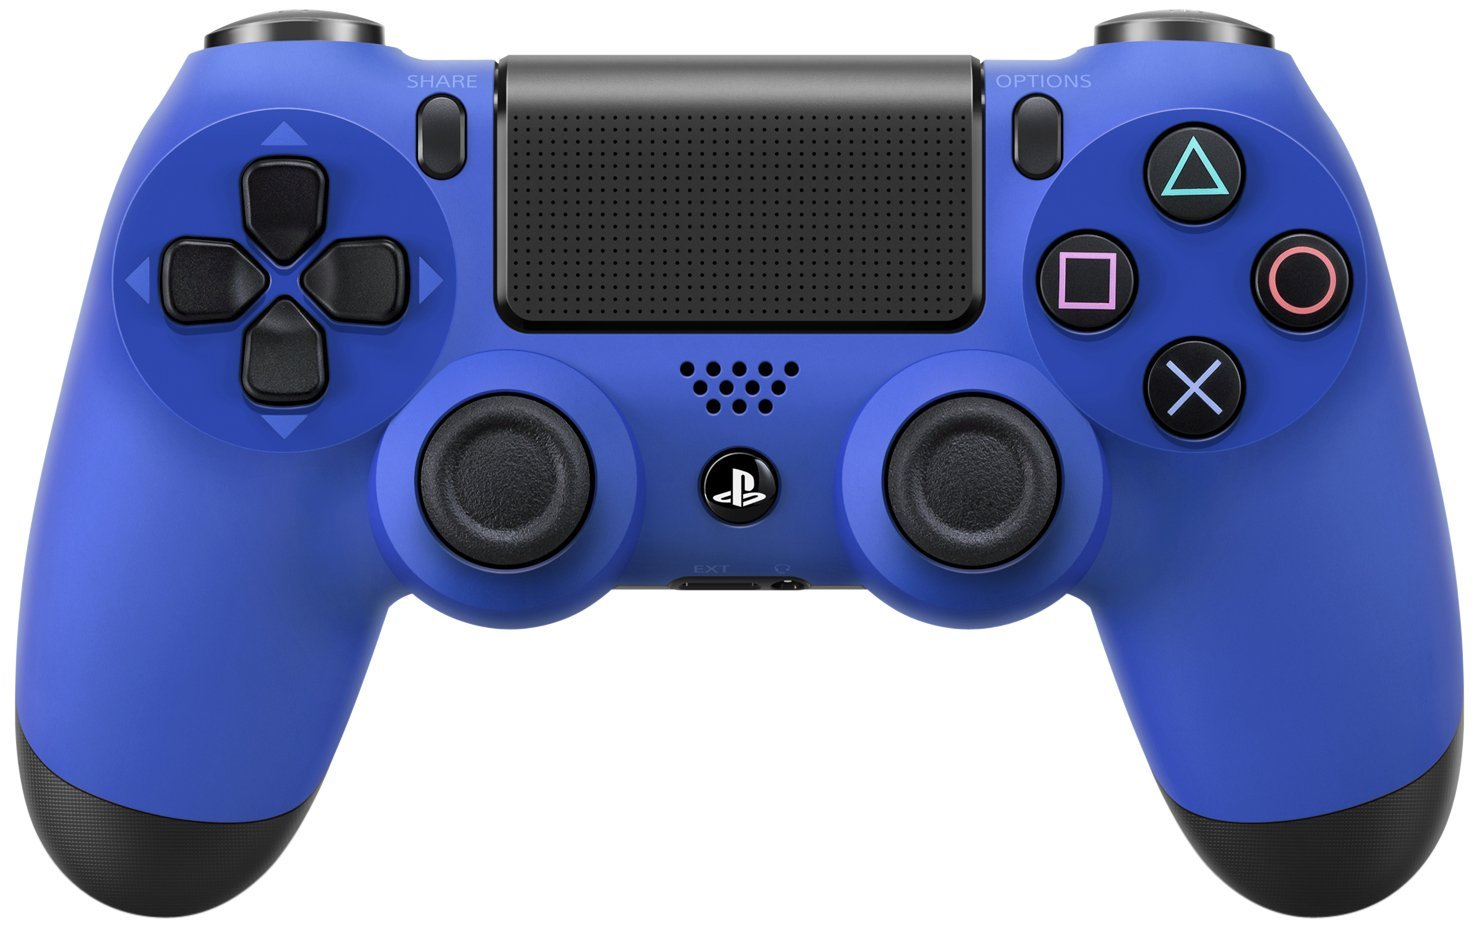 Геймпад беспроводной Sony Dualshock 4 [PS4] (Wave Blue)